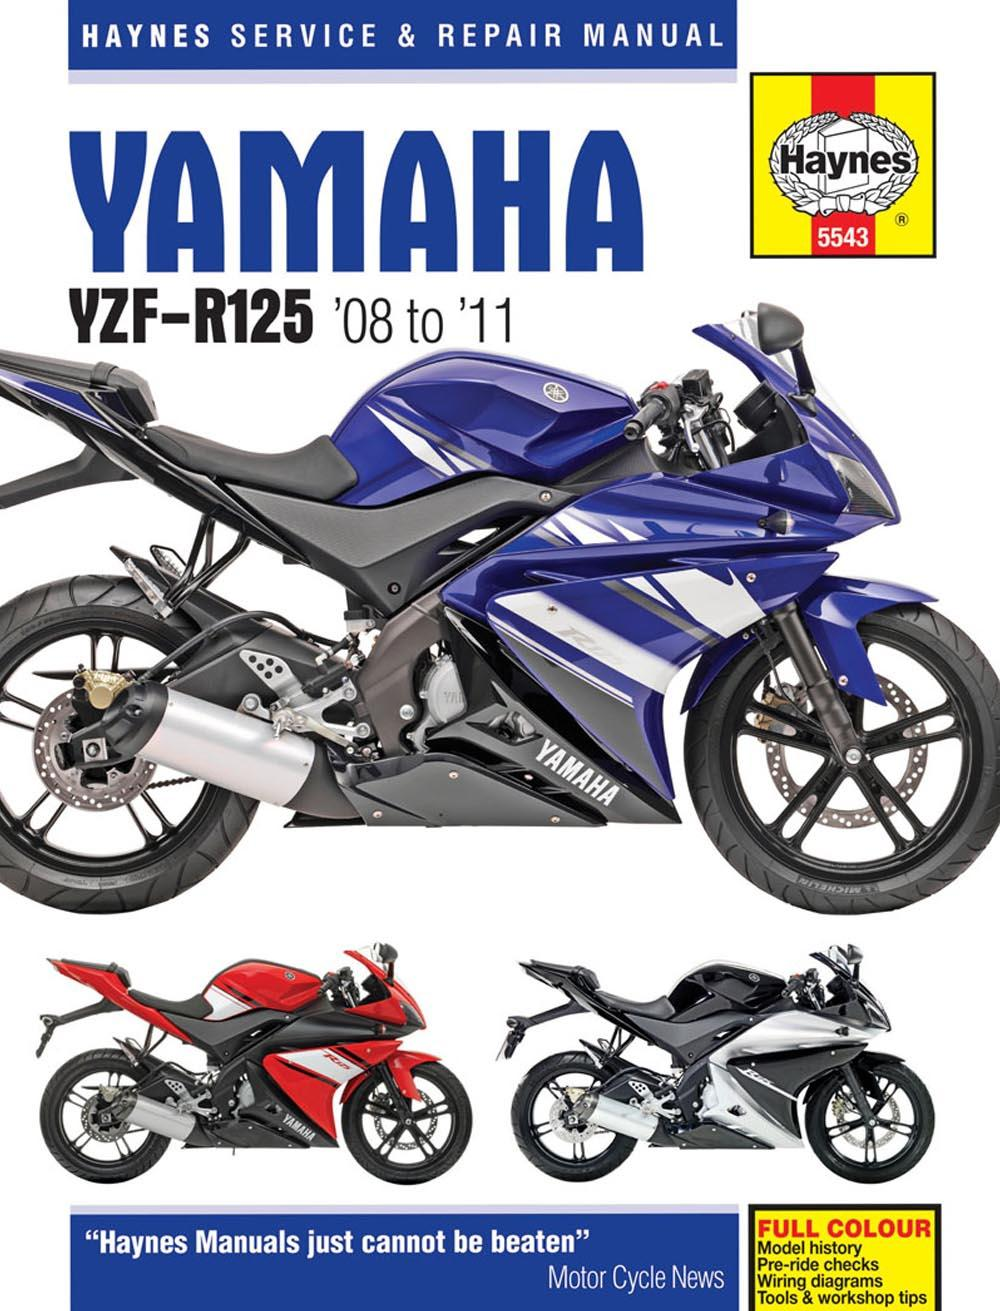 Manual Yamaha Yzf R125 2001 Kawasaki Vulcan 1500 Wiring Diagram Schematic 2008 Array Haynes 08 11 Manu Rh Halfords Com